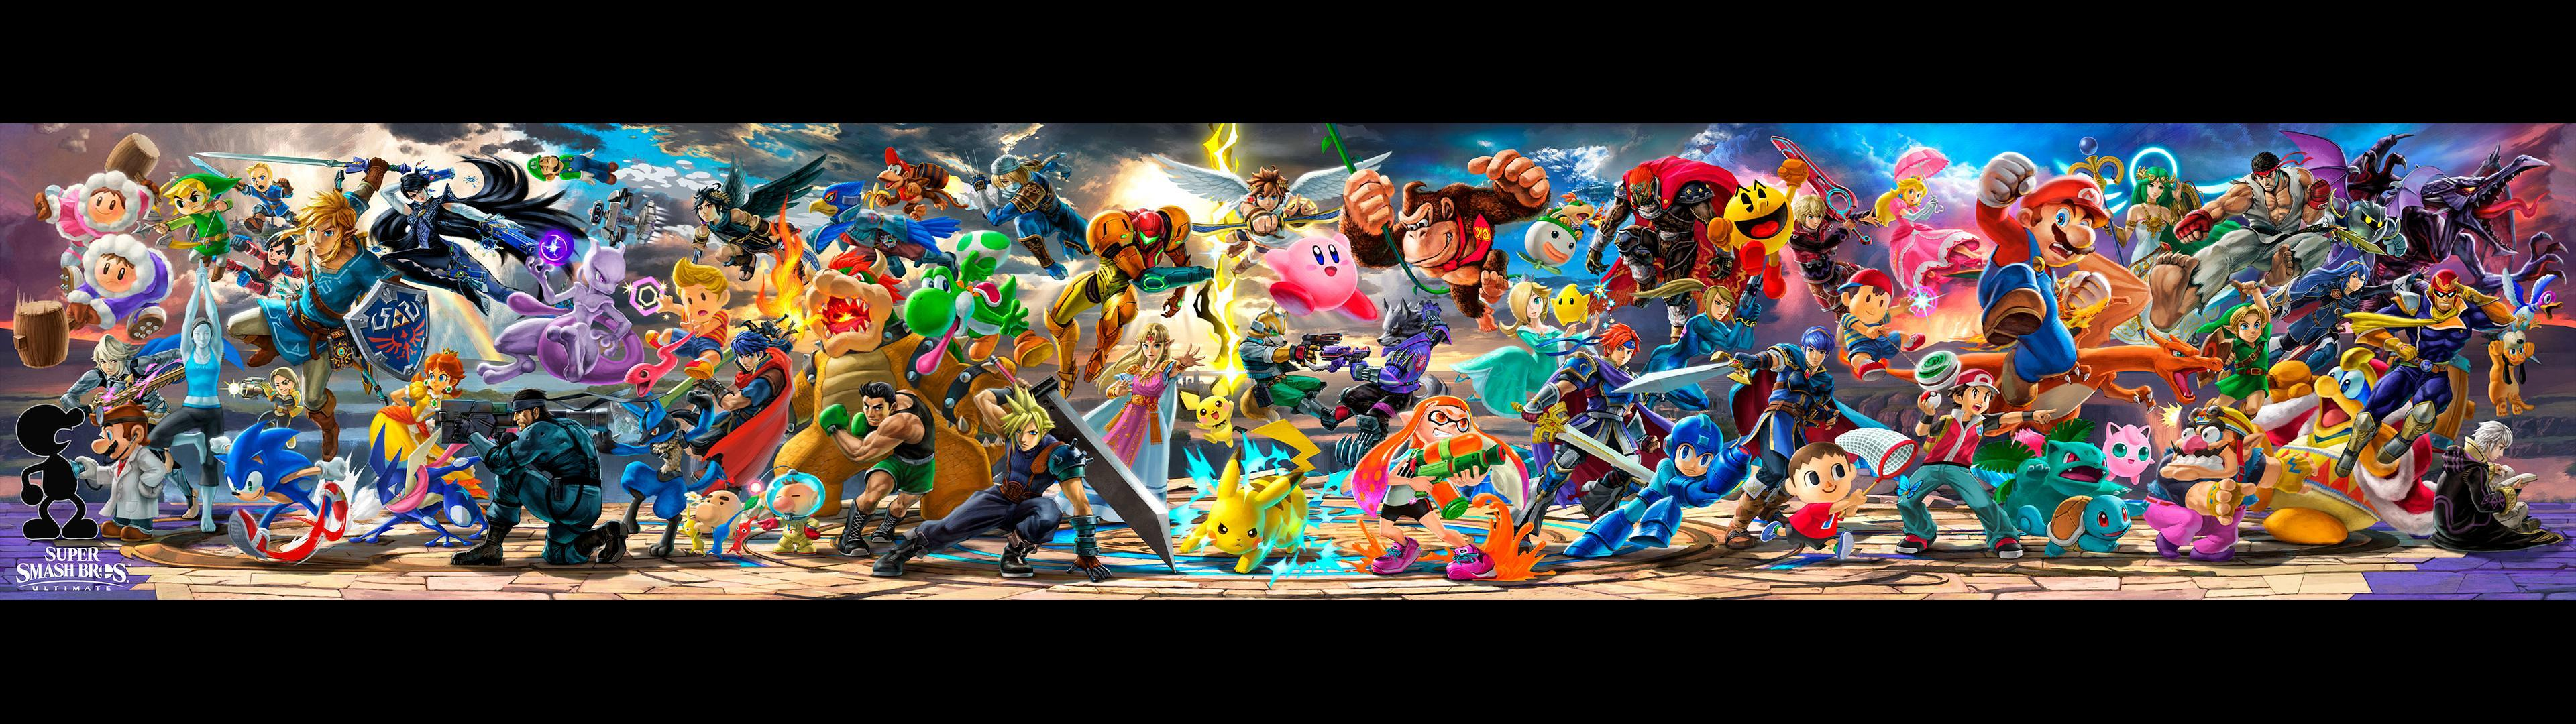 Super Smash Bros Ultimate Wallpapers - Wallpaper Cave